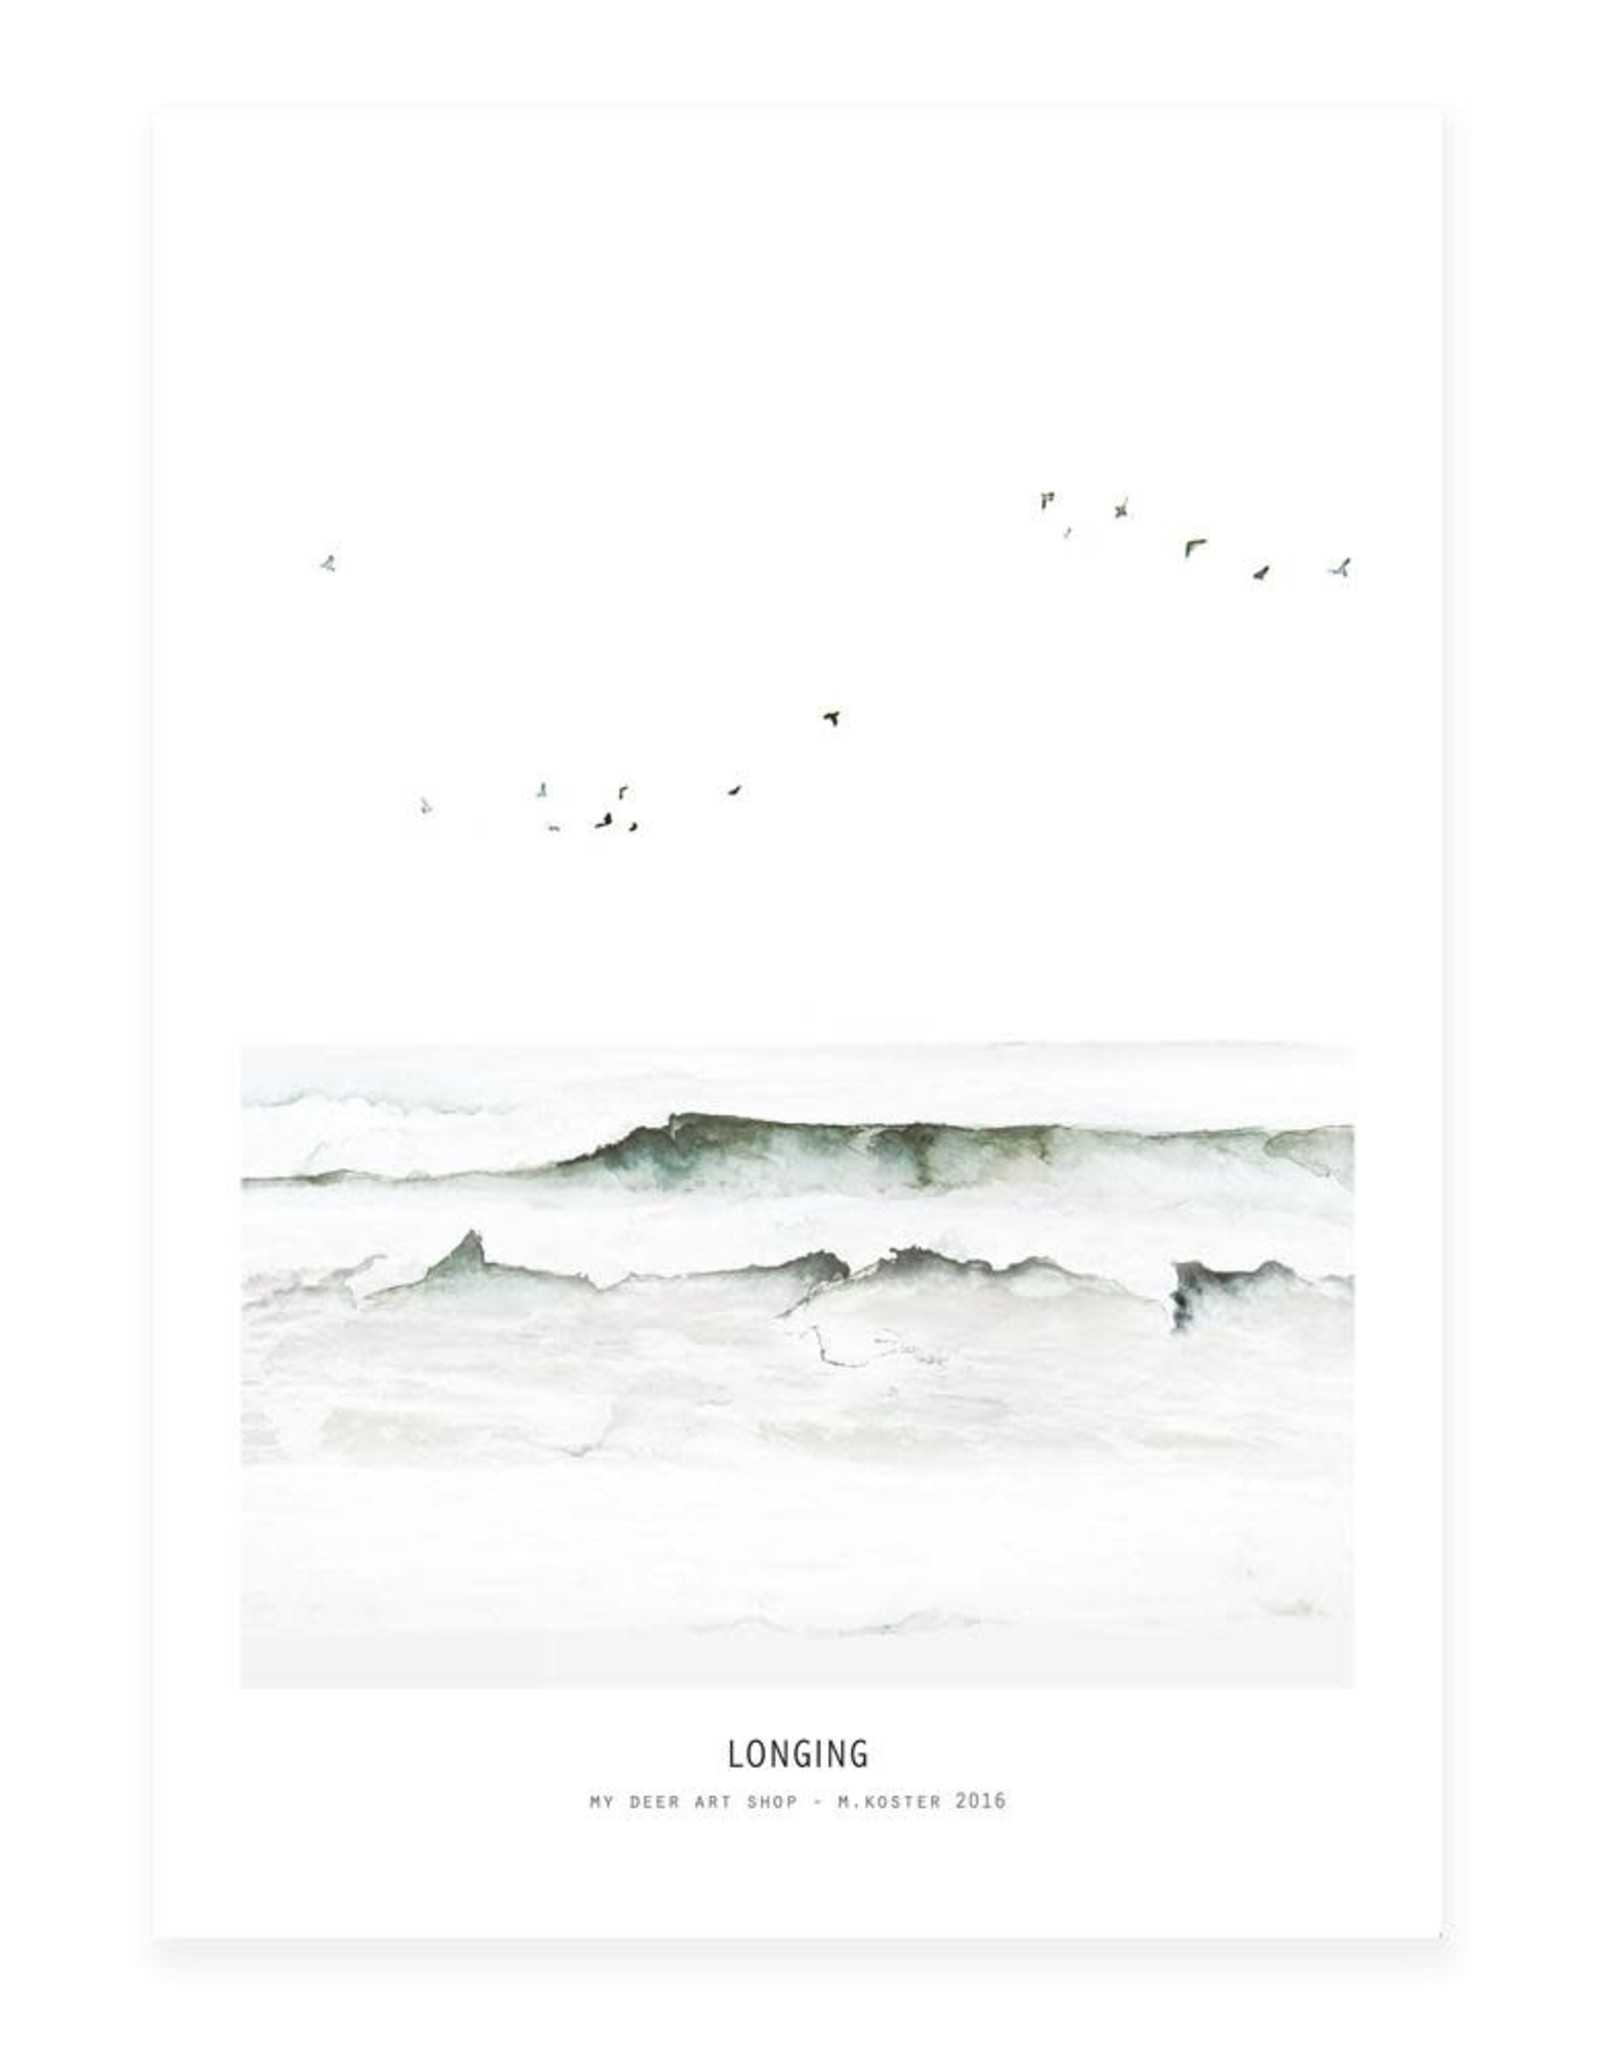 My deer art shop My deer art - mini prints - longing - A5